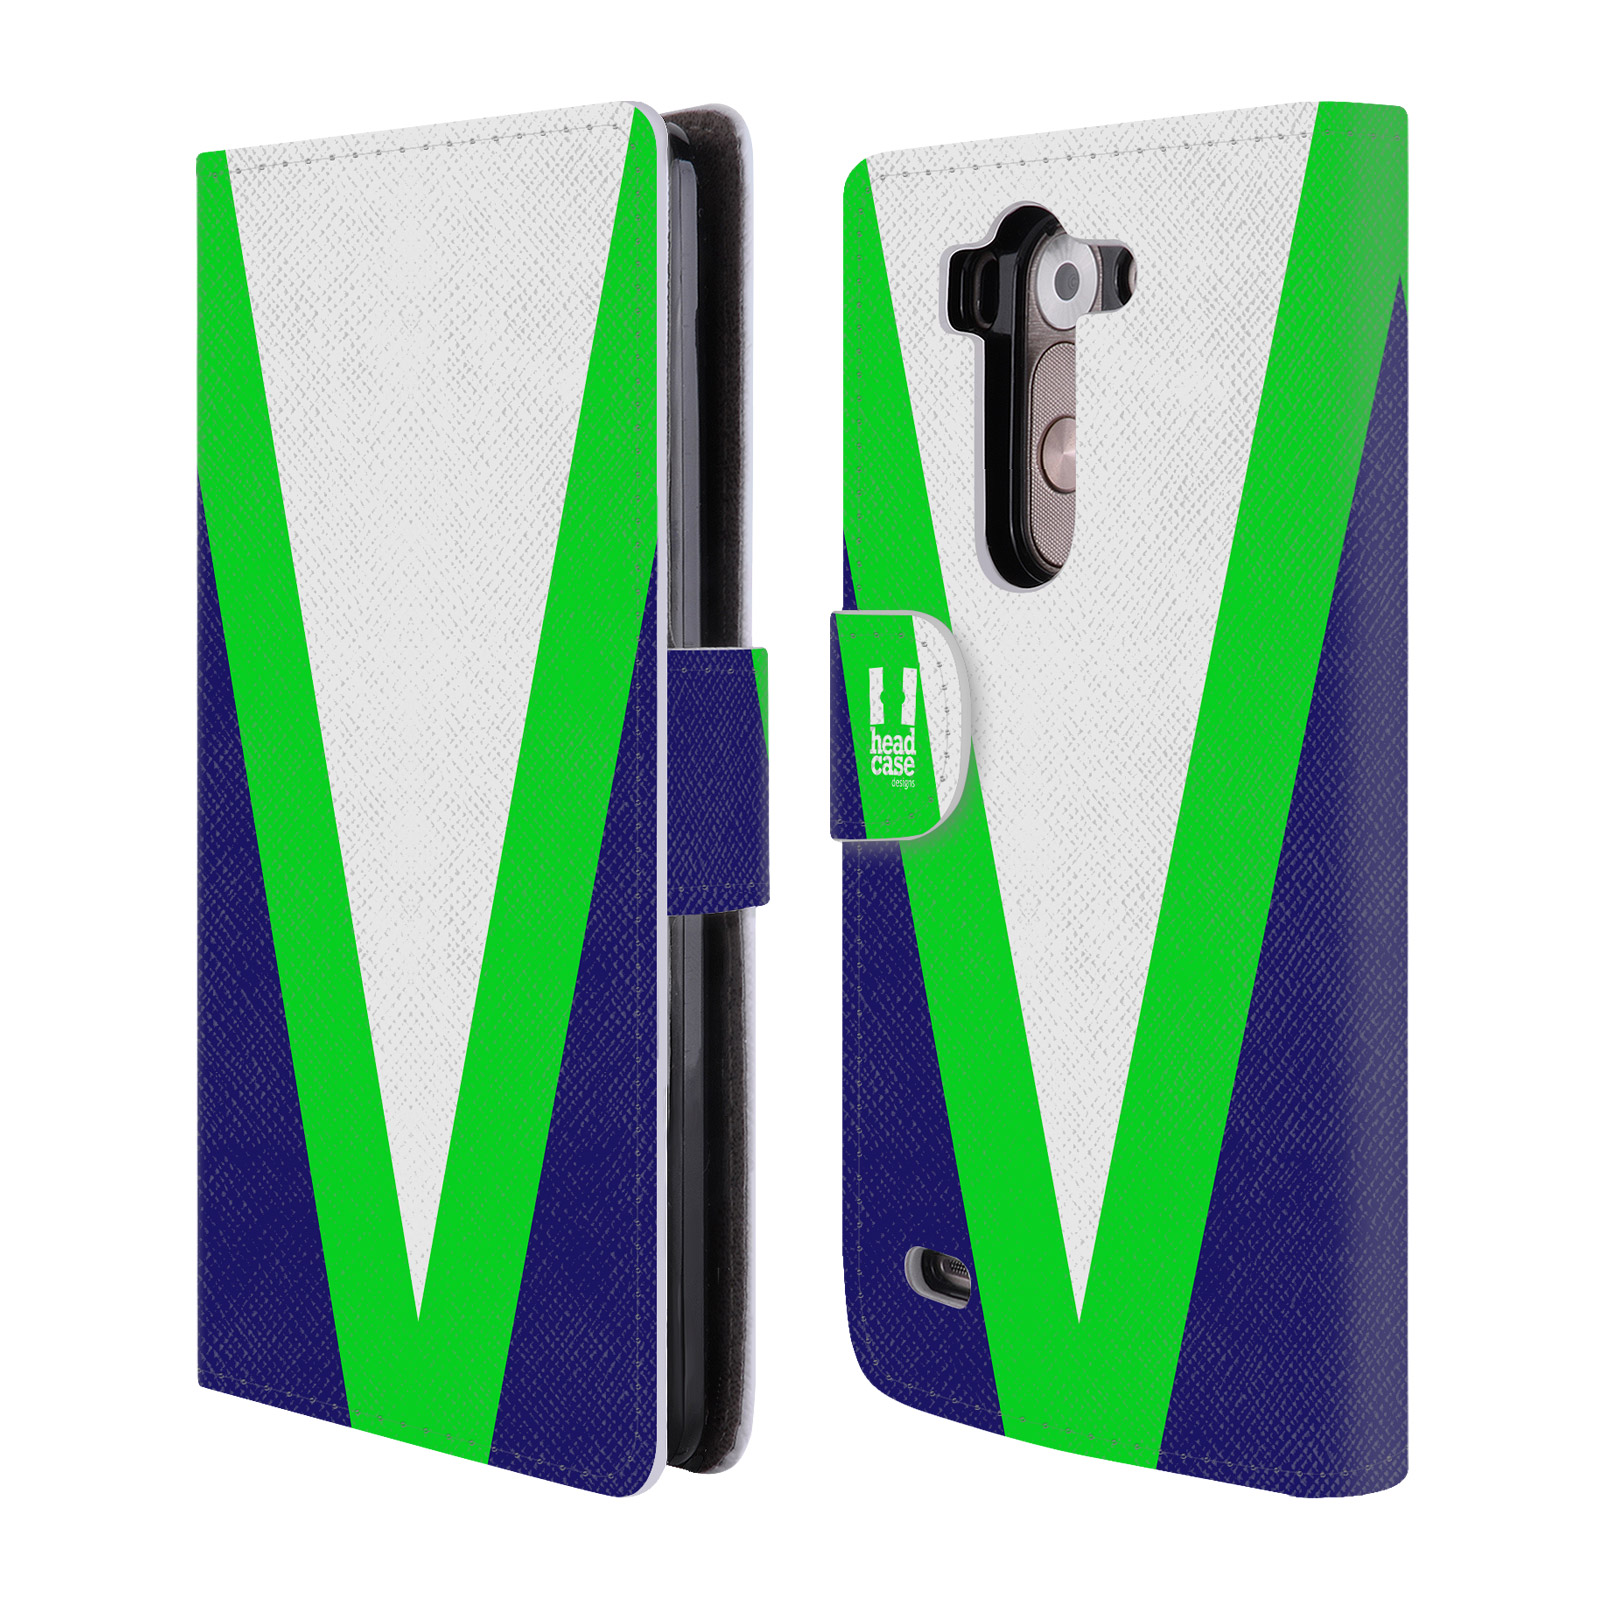 HEAD CASE Flipové pouzdro pro mobil LG G3s barevné tvary zelená a modrá